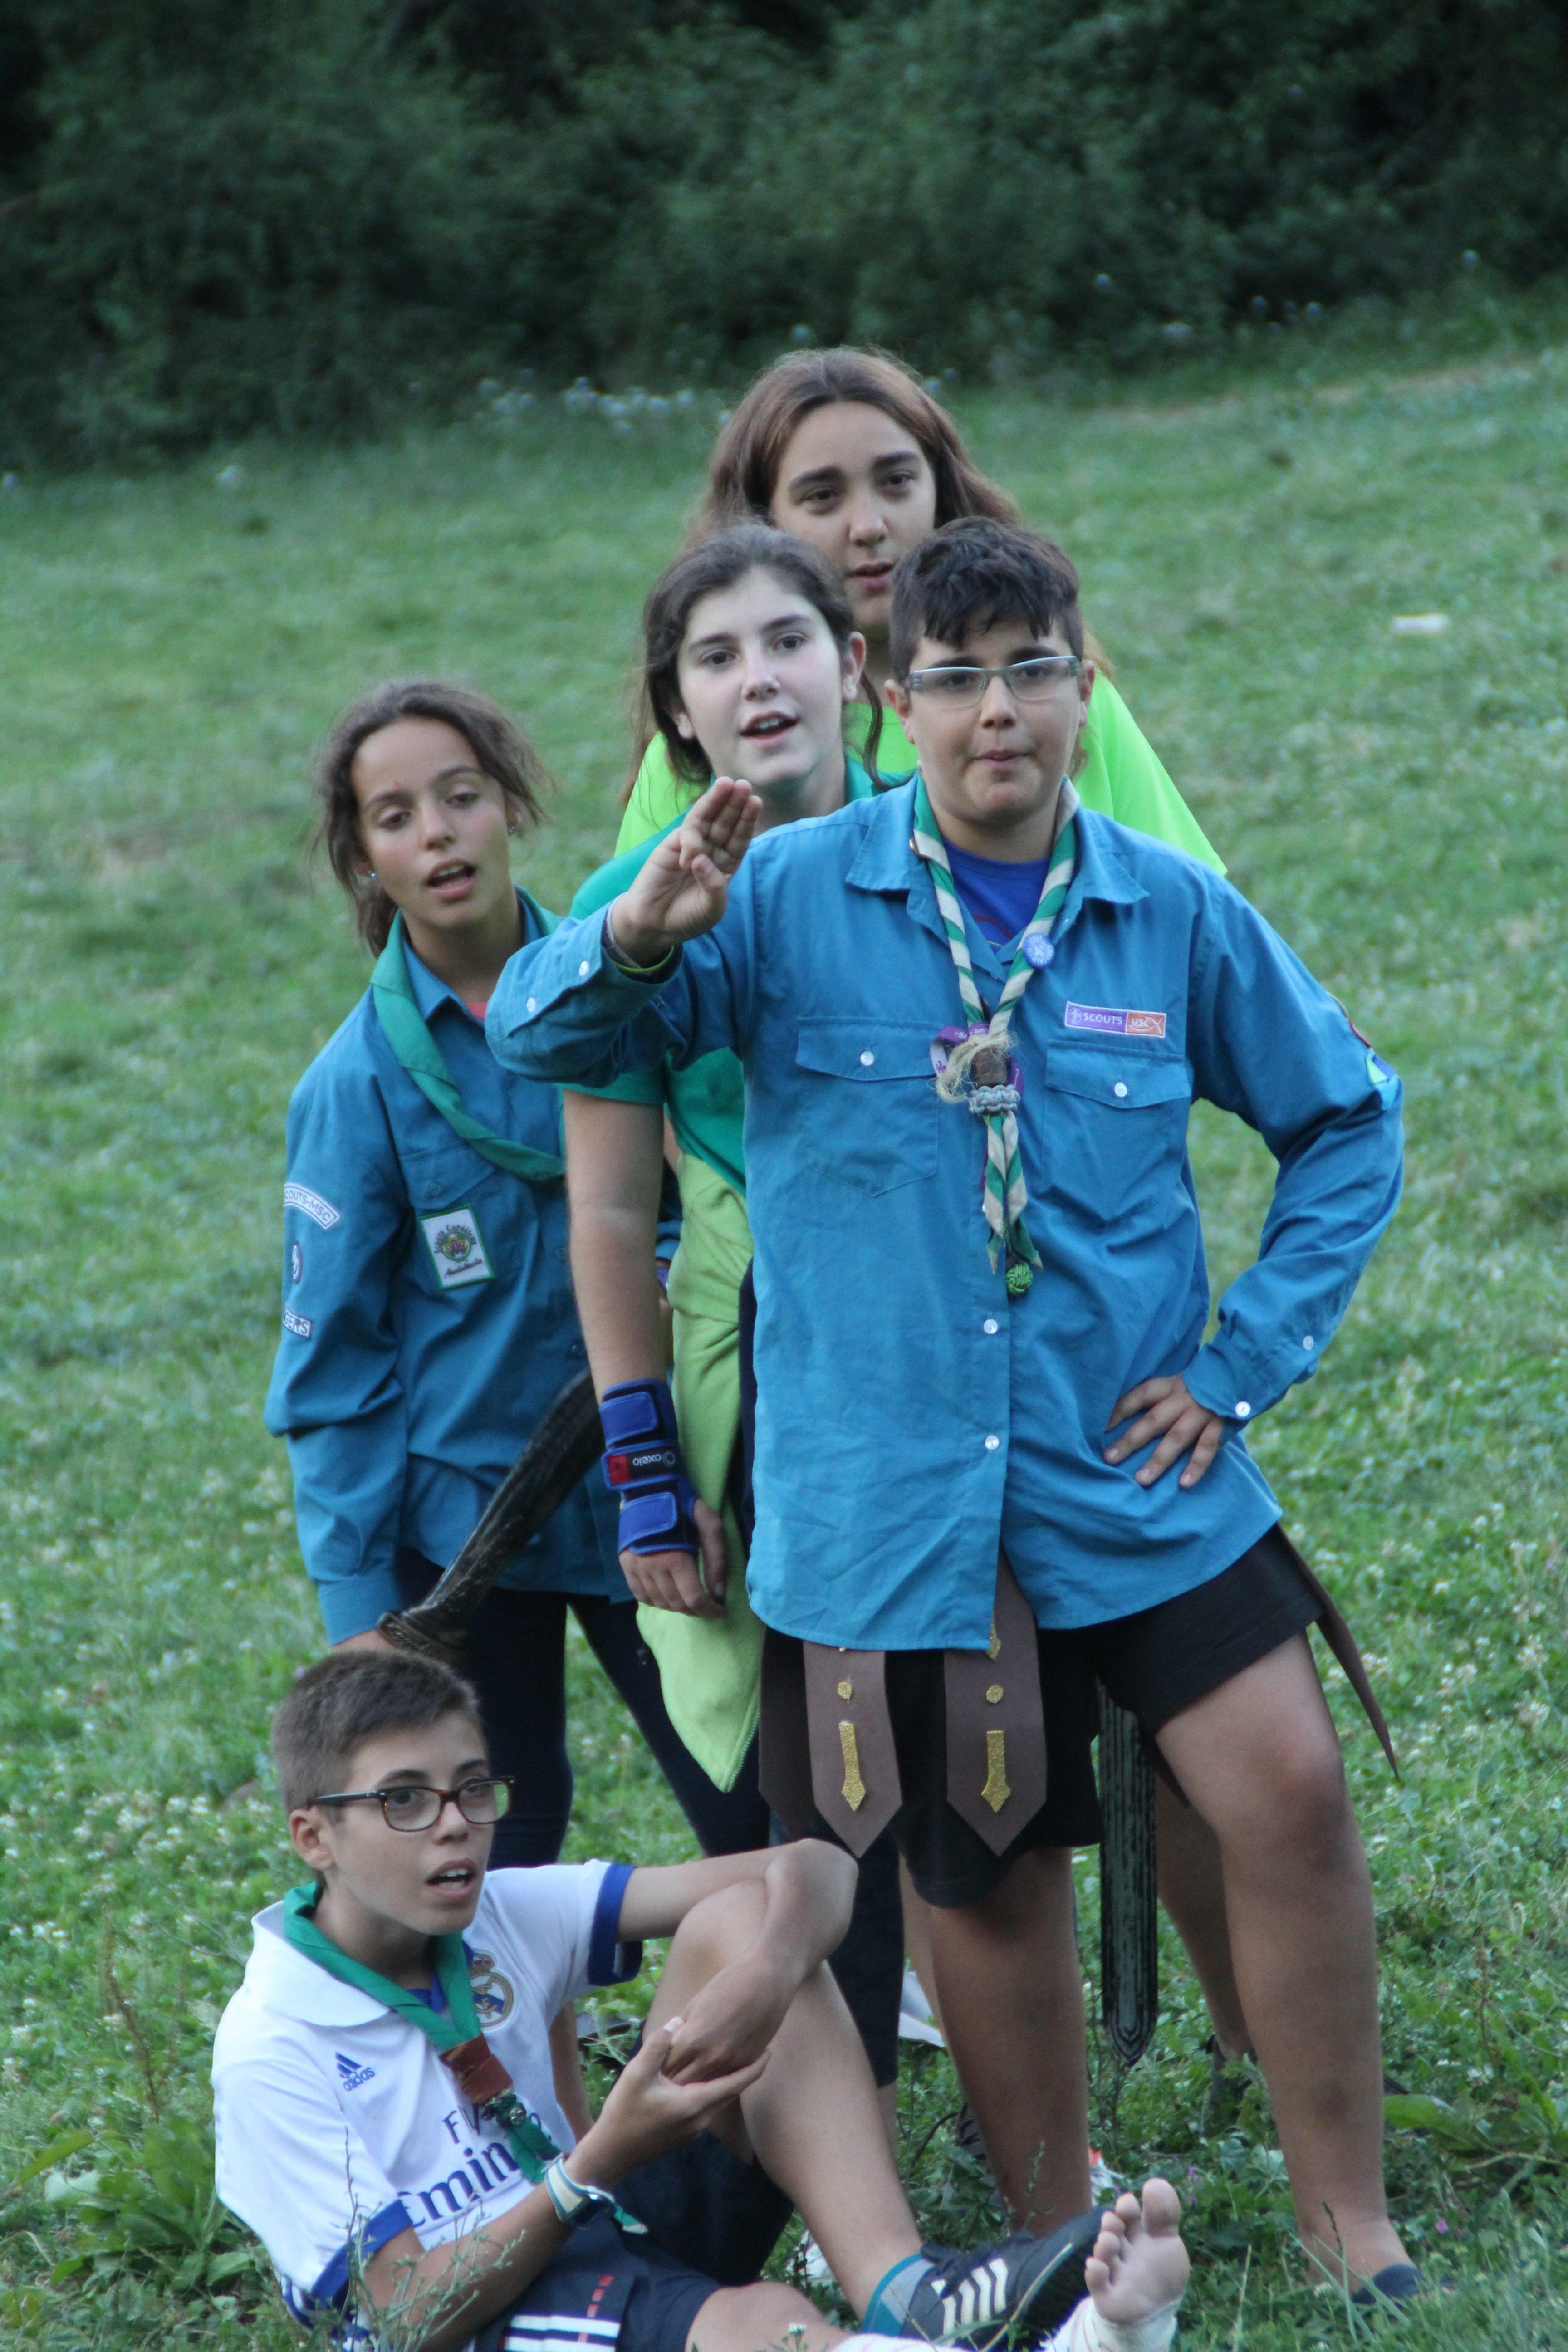 15-16 - Grupo - Campamento de verano - P282